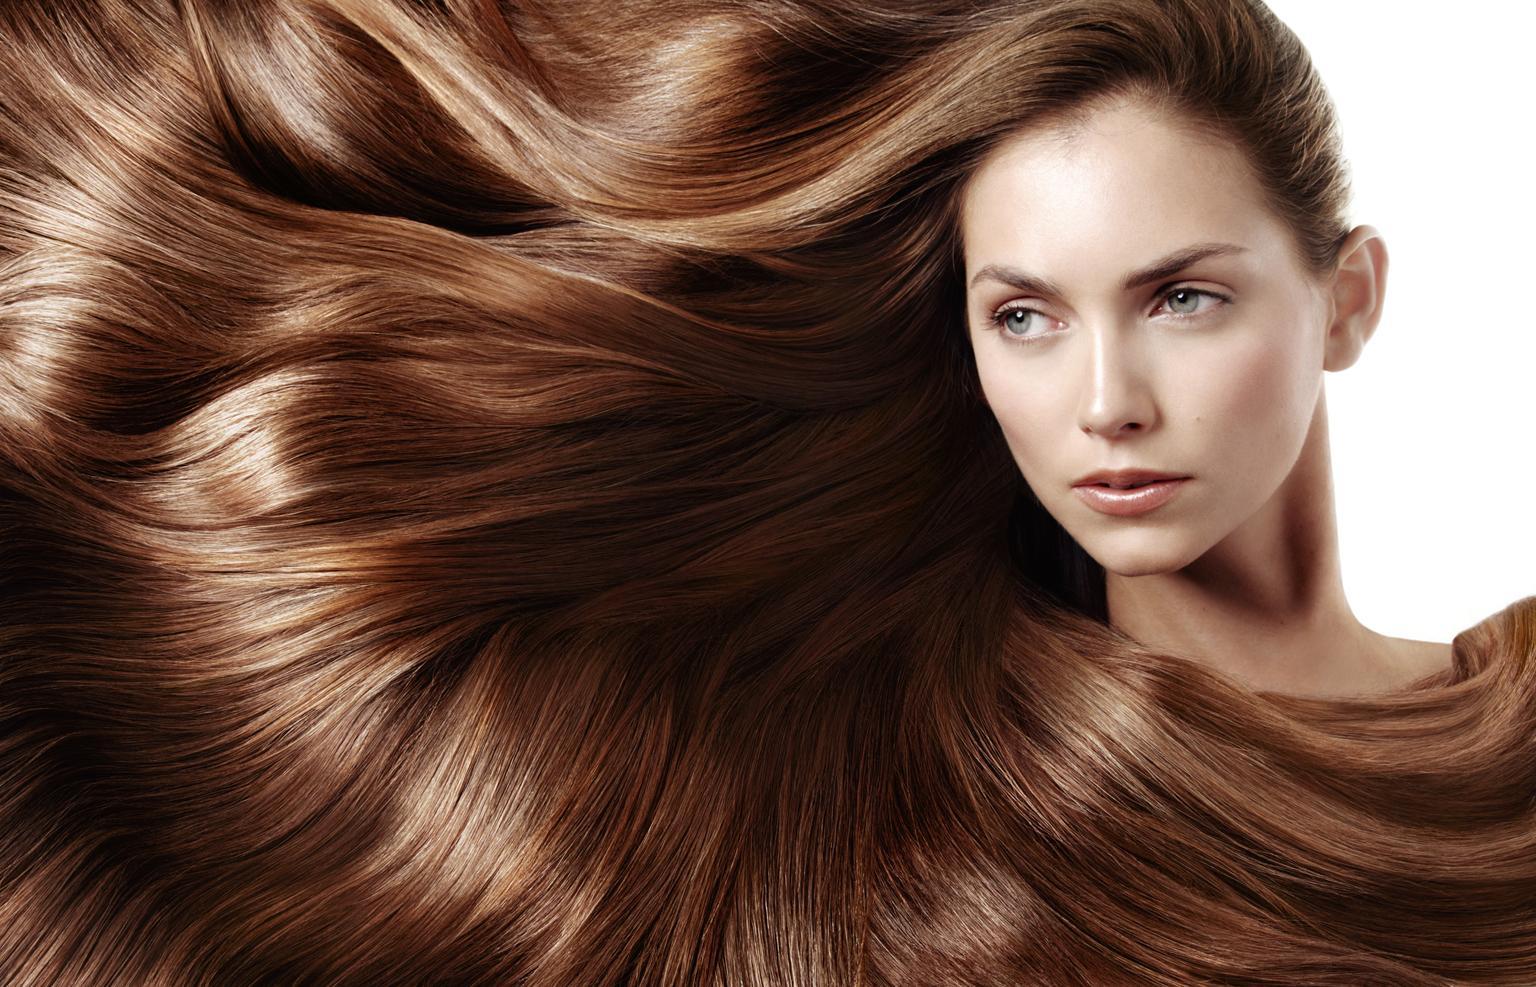 photo تاثیر نوع شامپو در ریزش مو چه قدر است؟